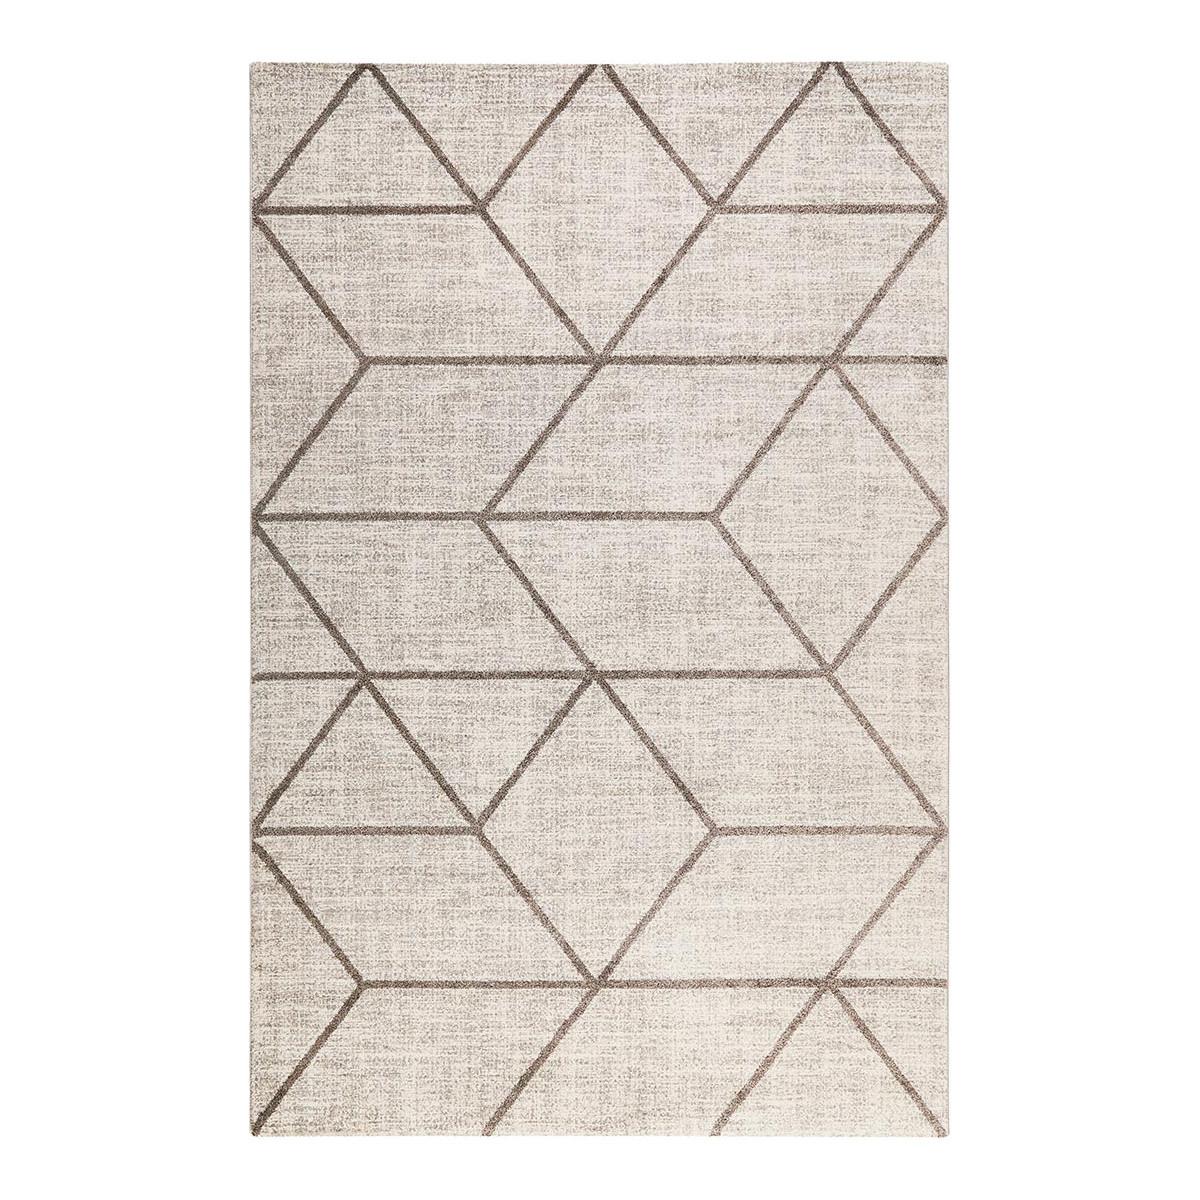 Tapis géométrique design en polypropylène taupe 80x150